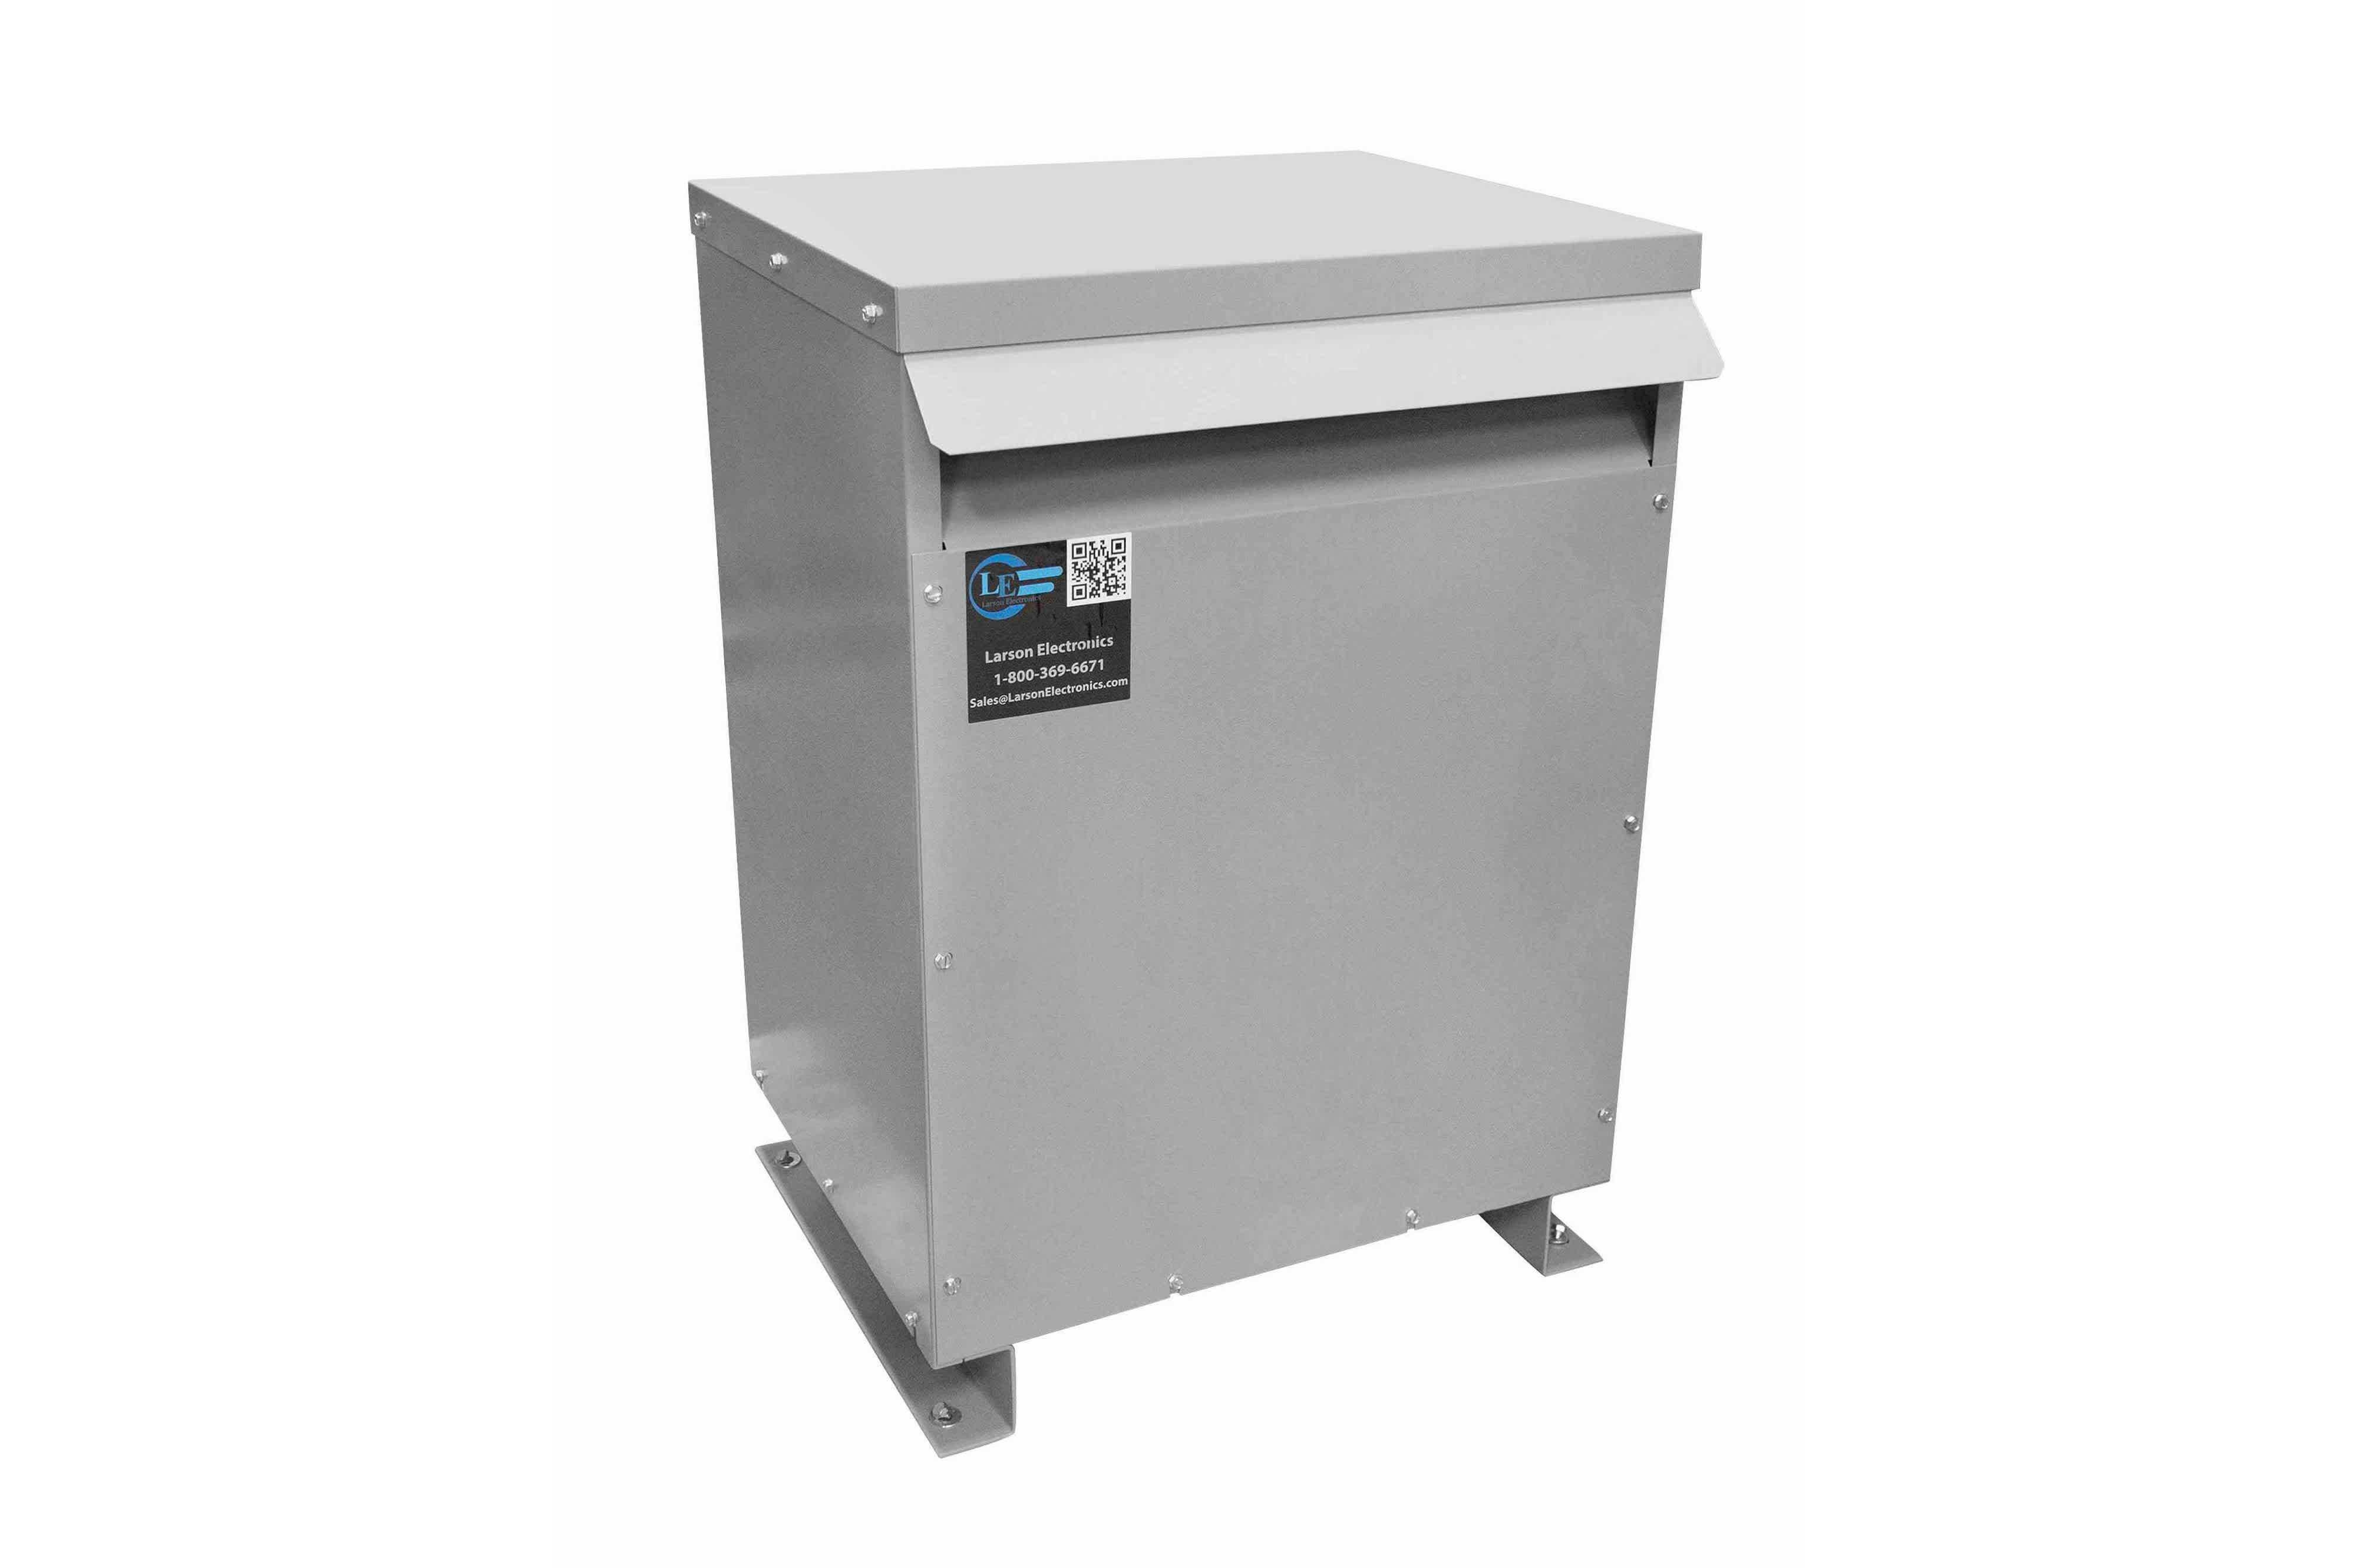 9 kVA 3PH Isolation Transformer, 575V Wye Primary, 415V Delta Secondary, N3R, Ventilated, 60 Hz